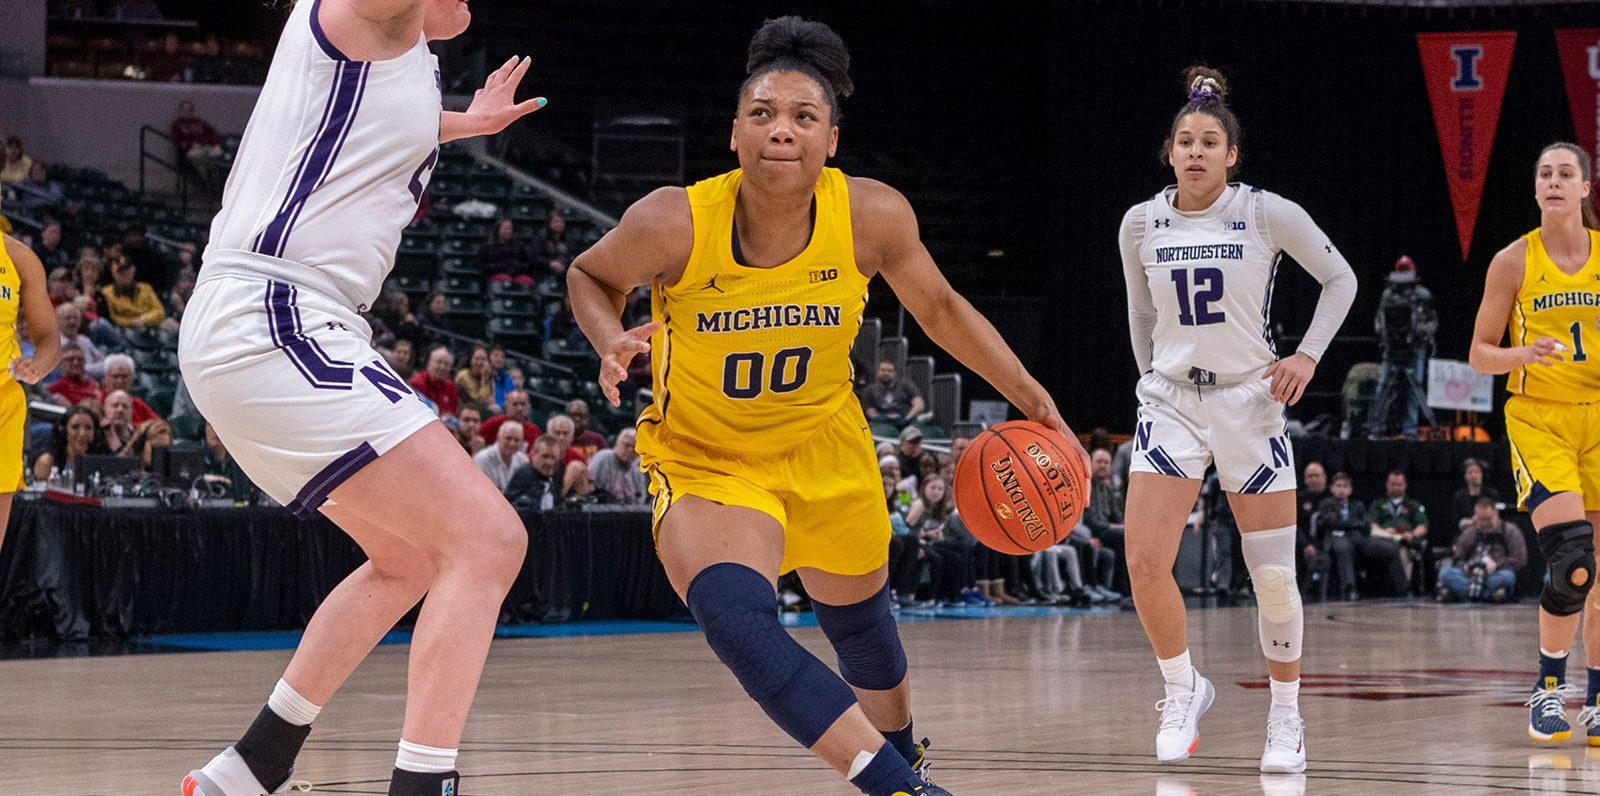 Naz Hillmon, de Michigan, hizo un doble-doble de 50 puntos y 16 rebotes